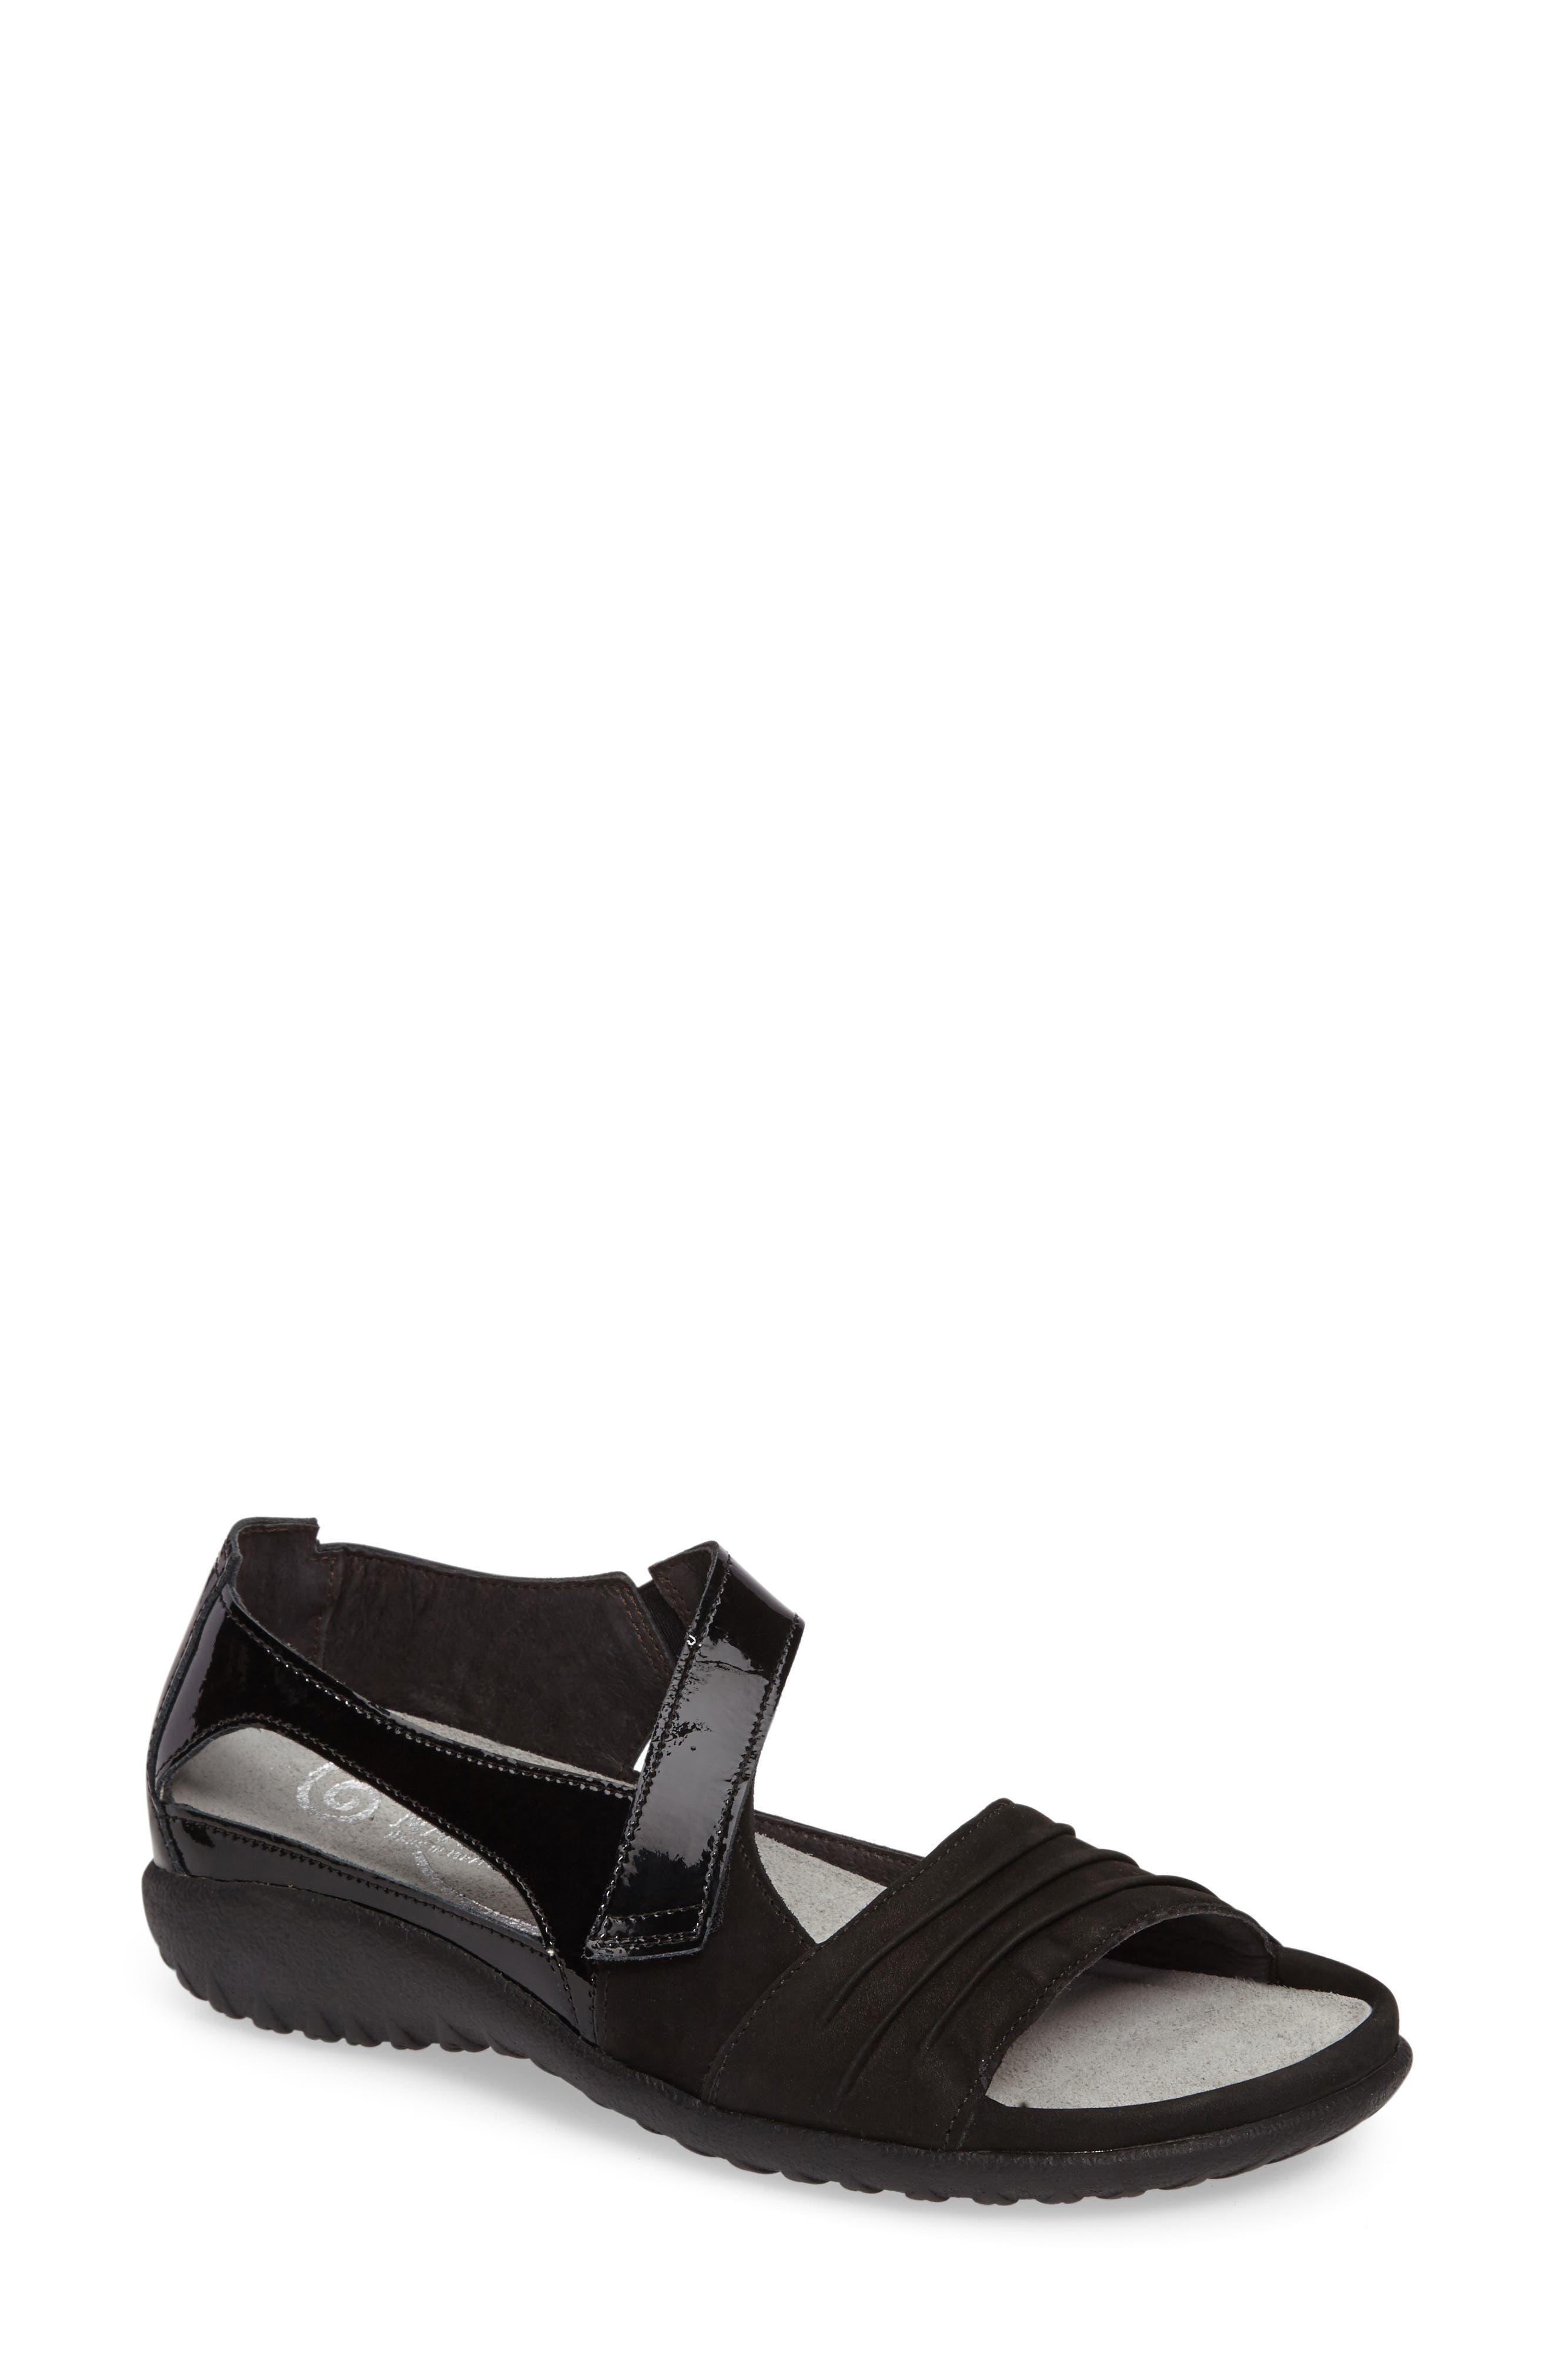 NAOT 'Papaki' Sandal